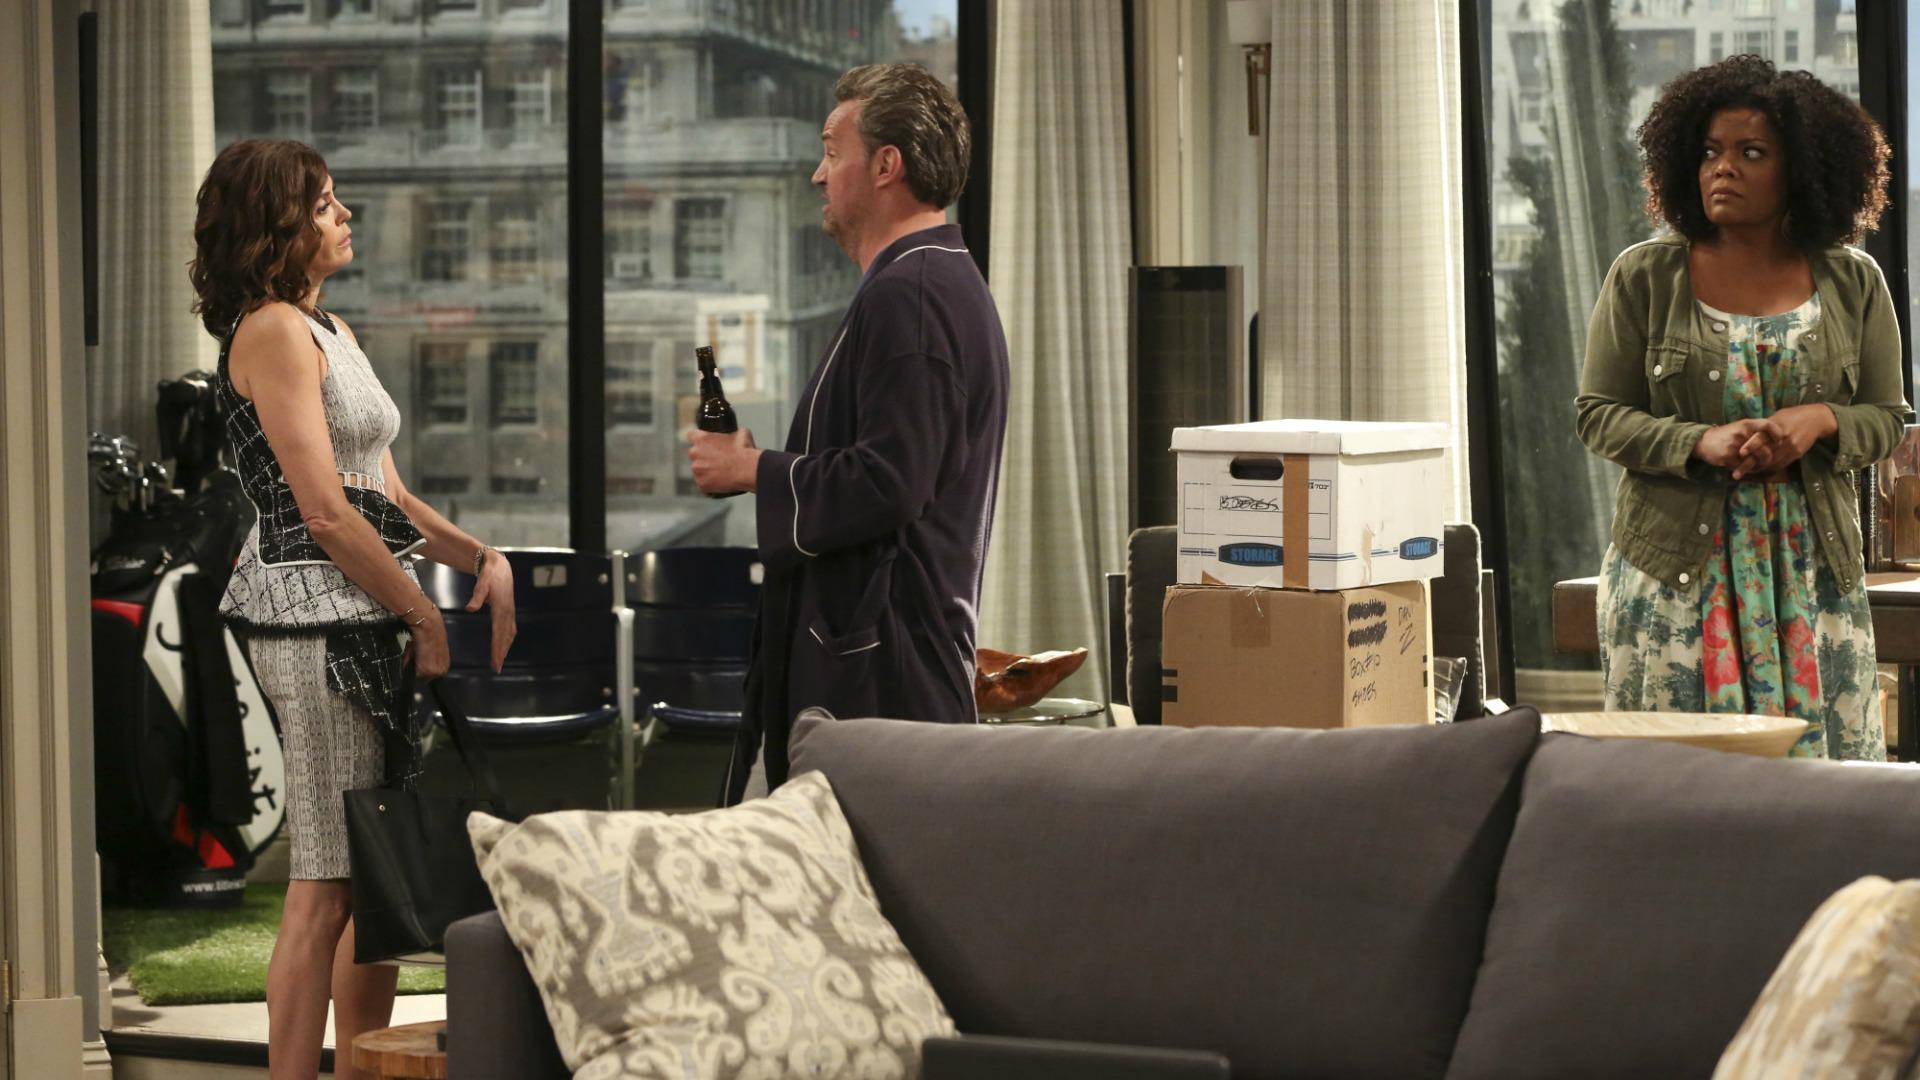 Dani eavesdrops on Charlotte and Oscar's conversation.